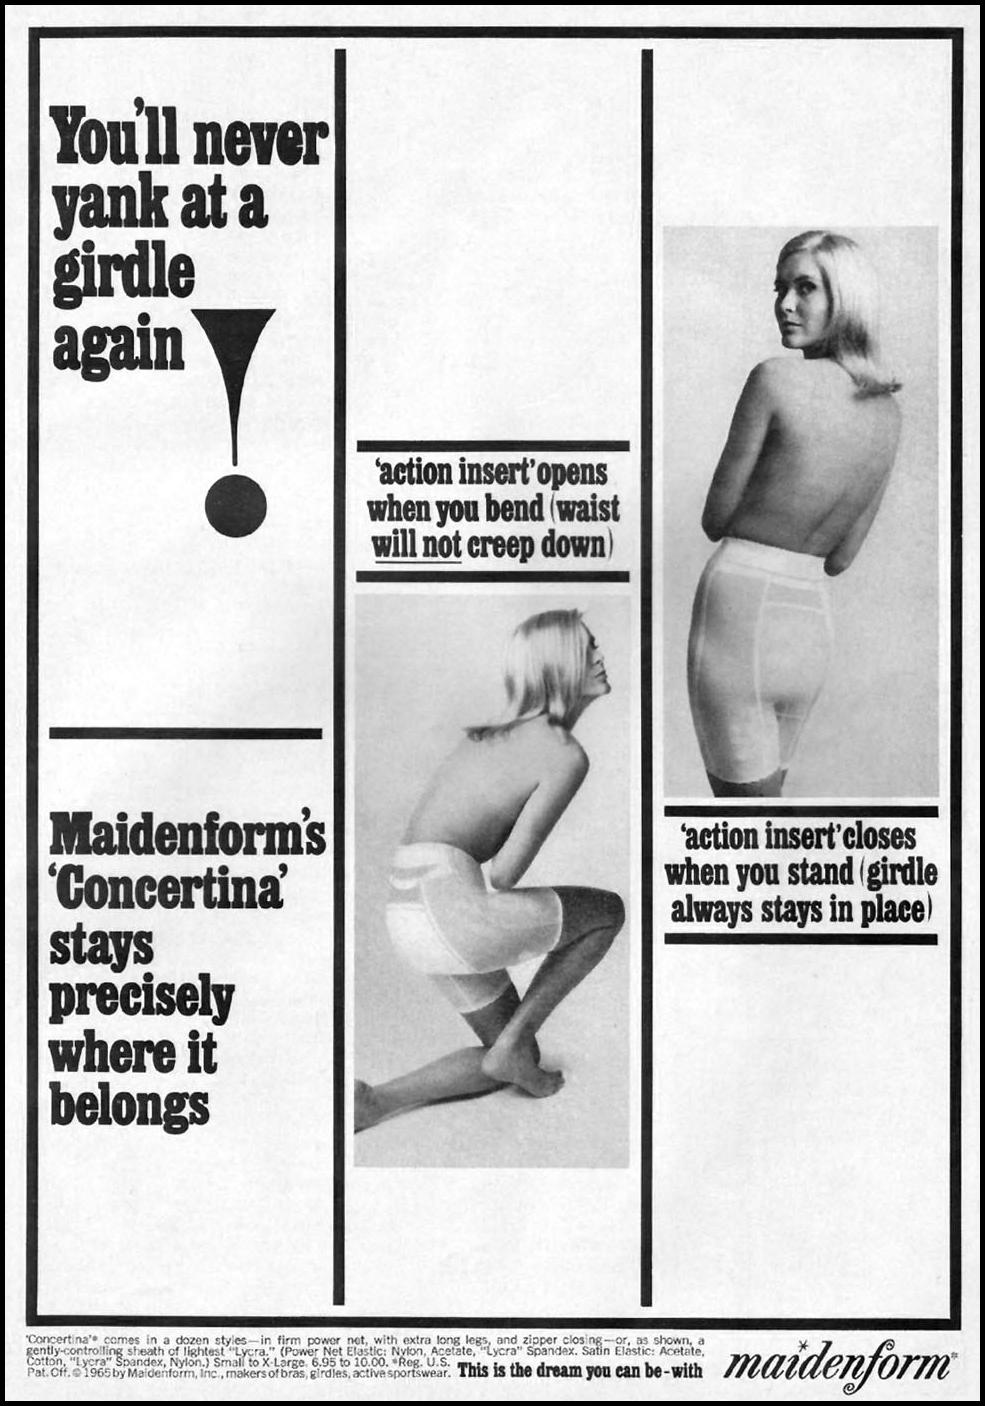 MAIDENFORM GIRDLES GOOD HOUSEKEEPING 10/01/1965 p. 19